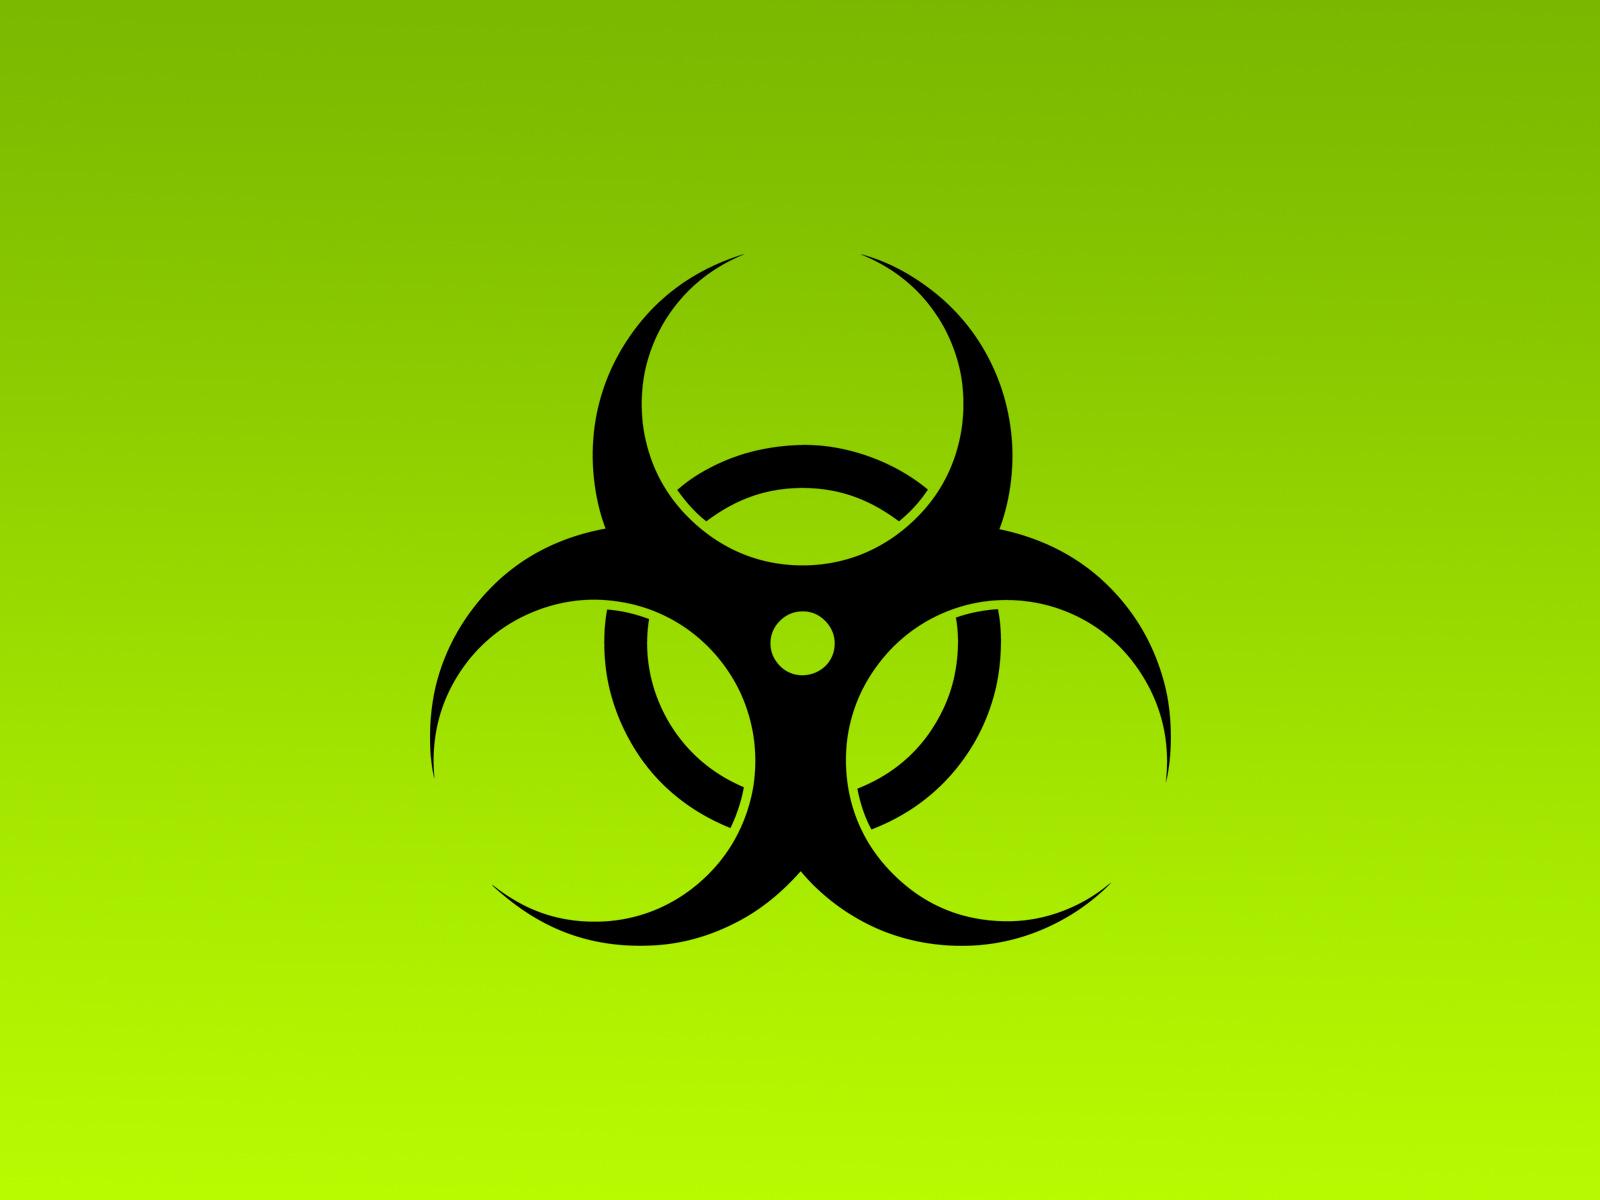 Wallpapers Box BioHazard   Radioactive Symbol HD Wallpapers 1600x1200